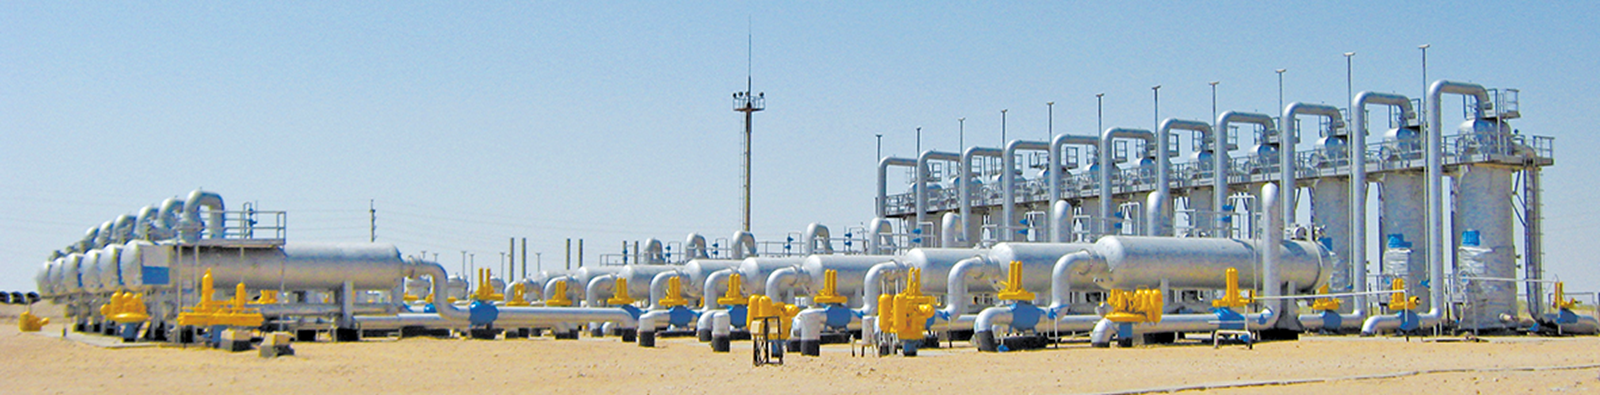 https://oilgas.gov.tm/storage/posts/880/original-15f8575489857d.png